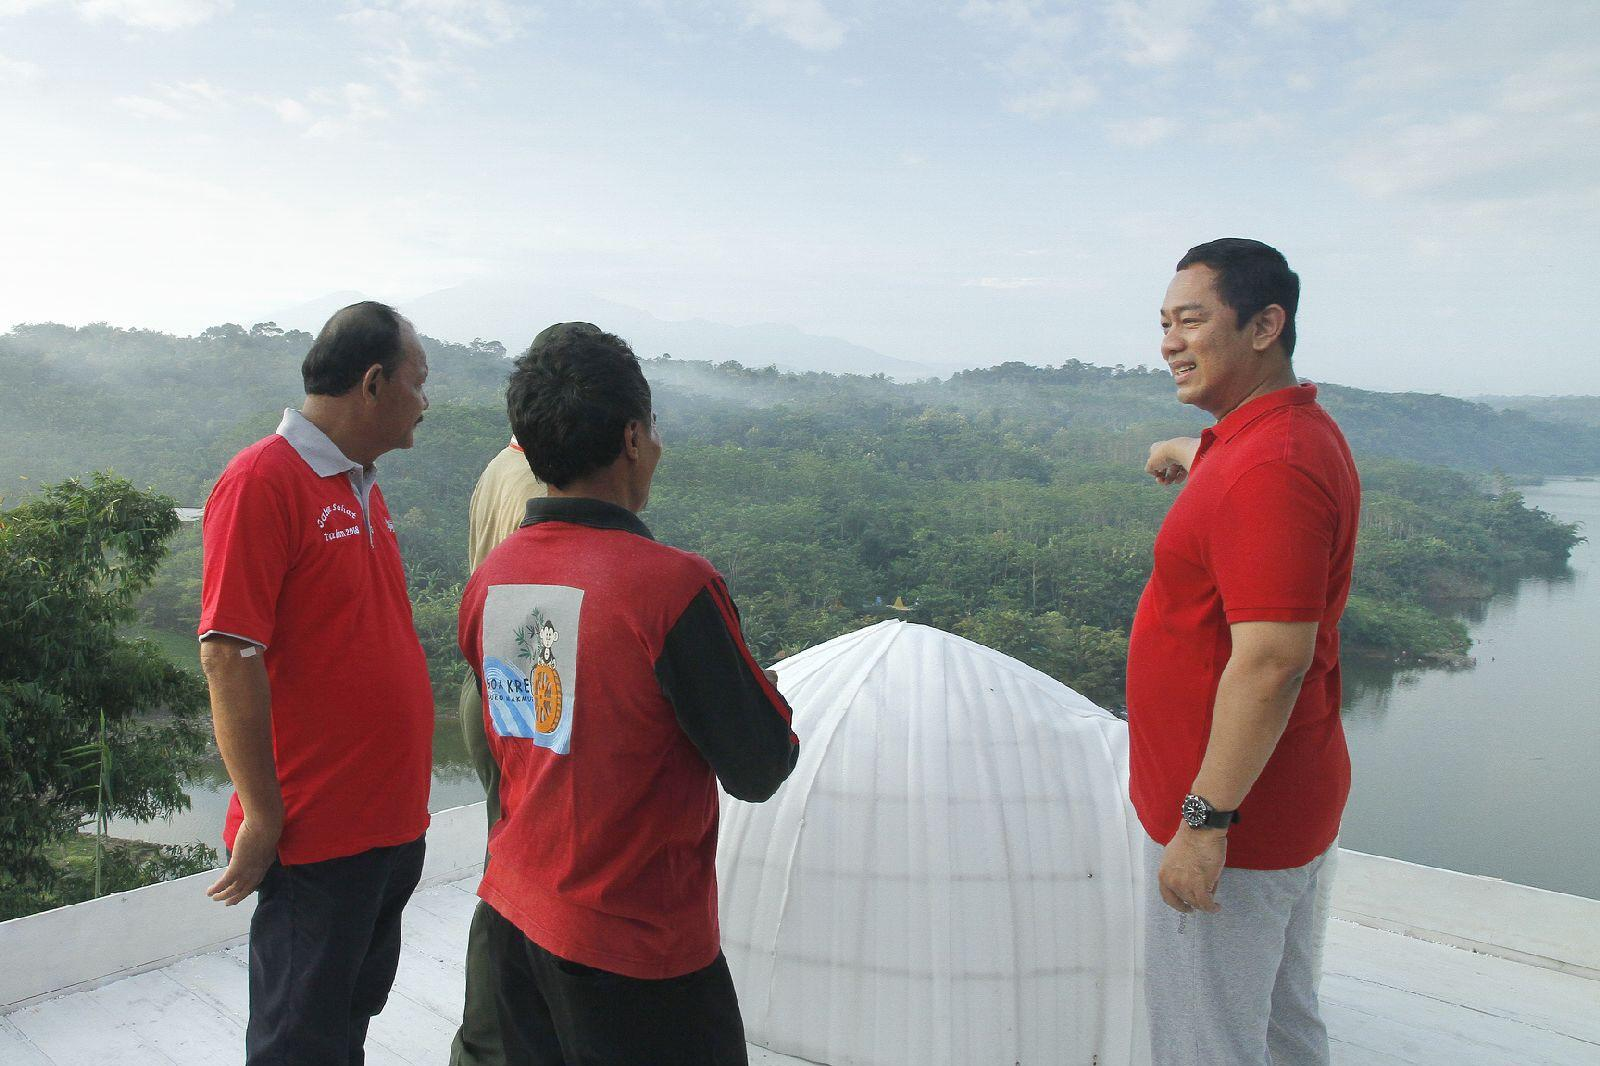 Wali Kota Semarang Hendrar Prihadi melihat air di Wadung Jatibarang seusai meresmikan homestay dengan wifi gratis. (foto: Liputan6.com/felek wahyu)